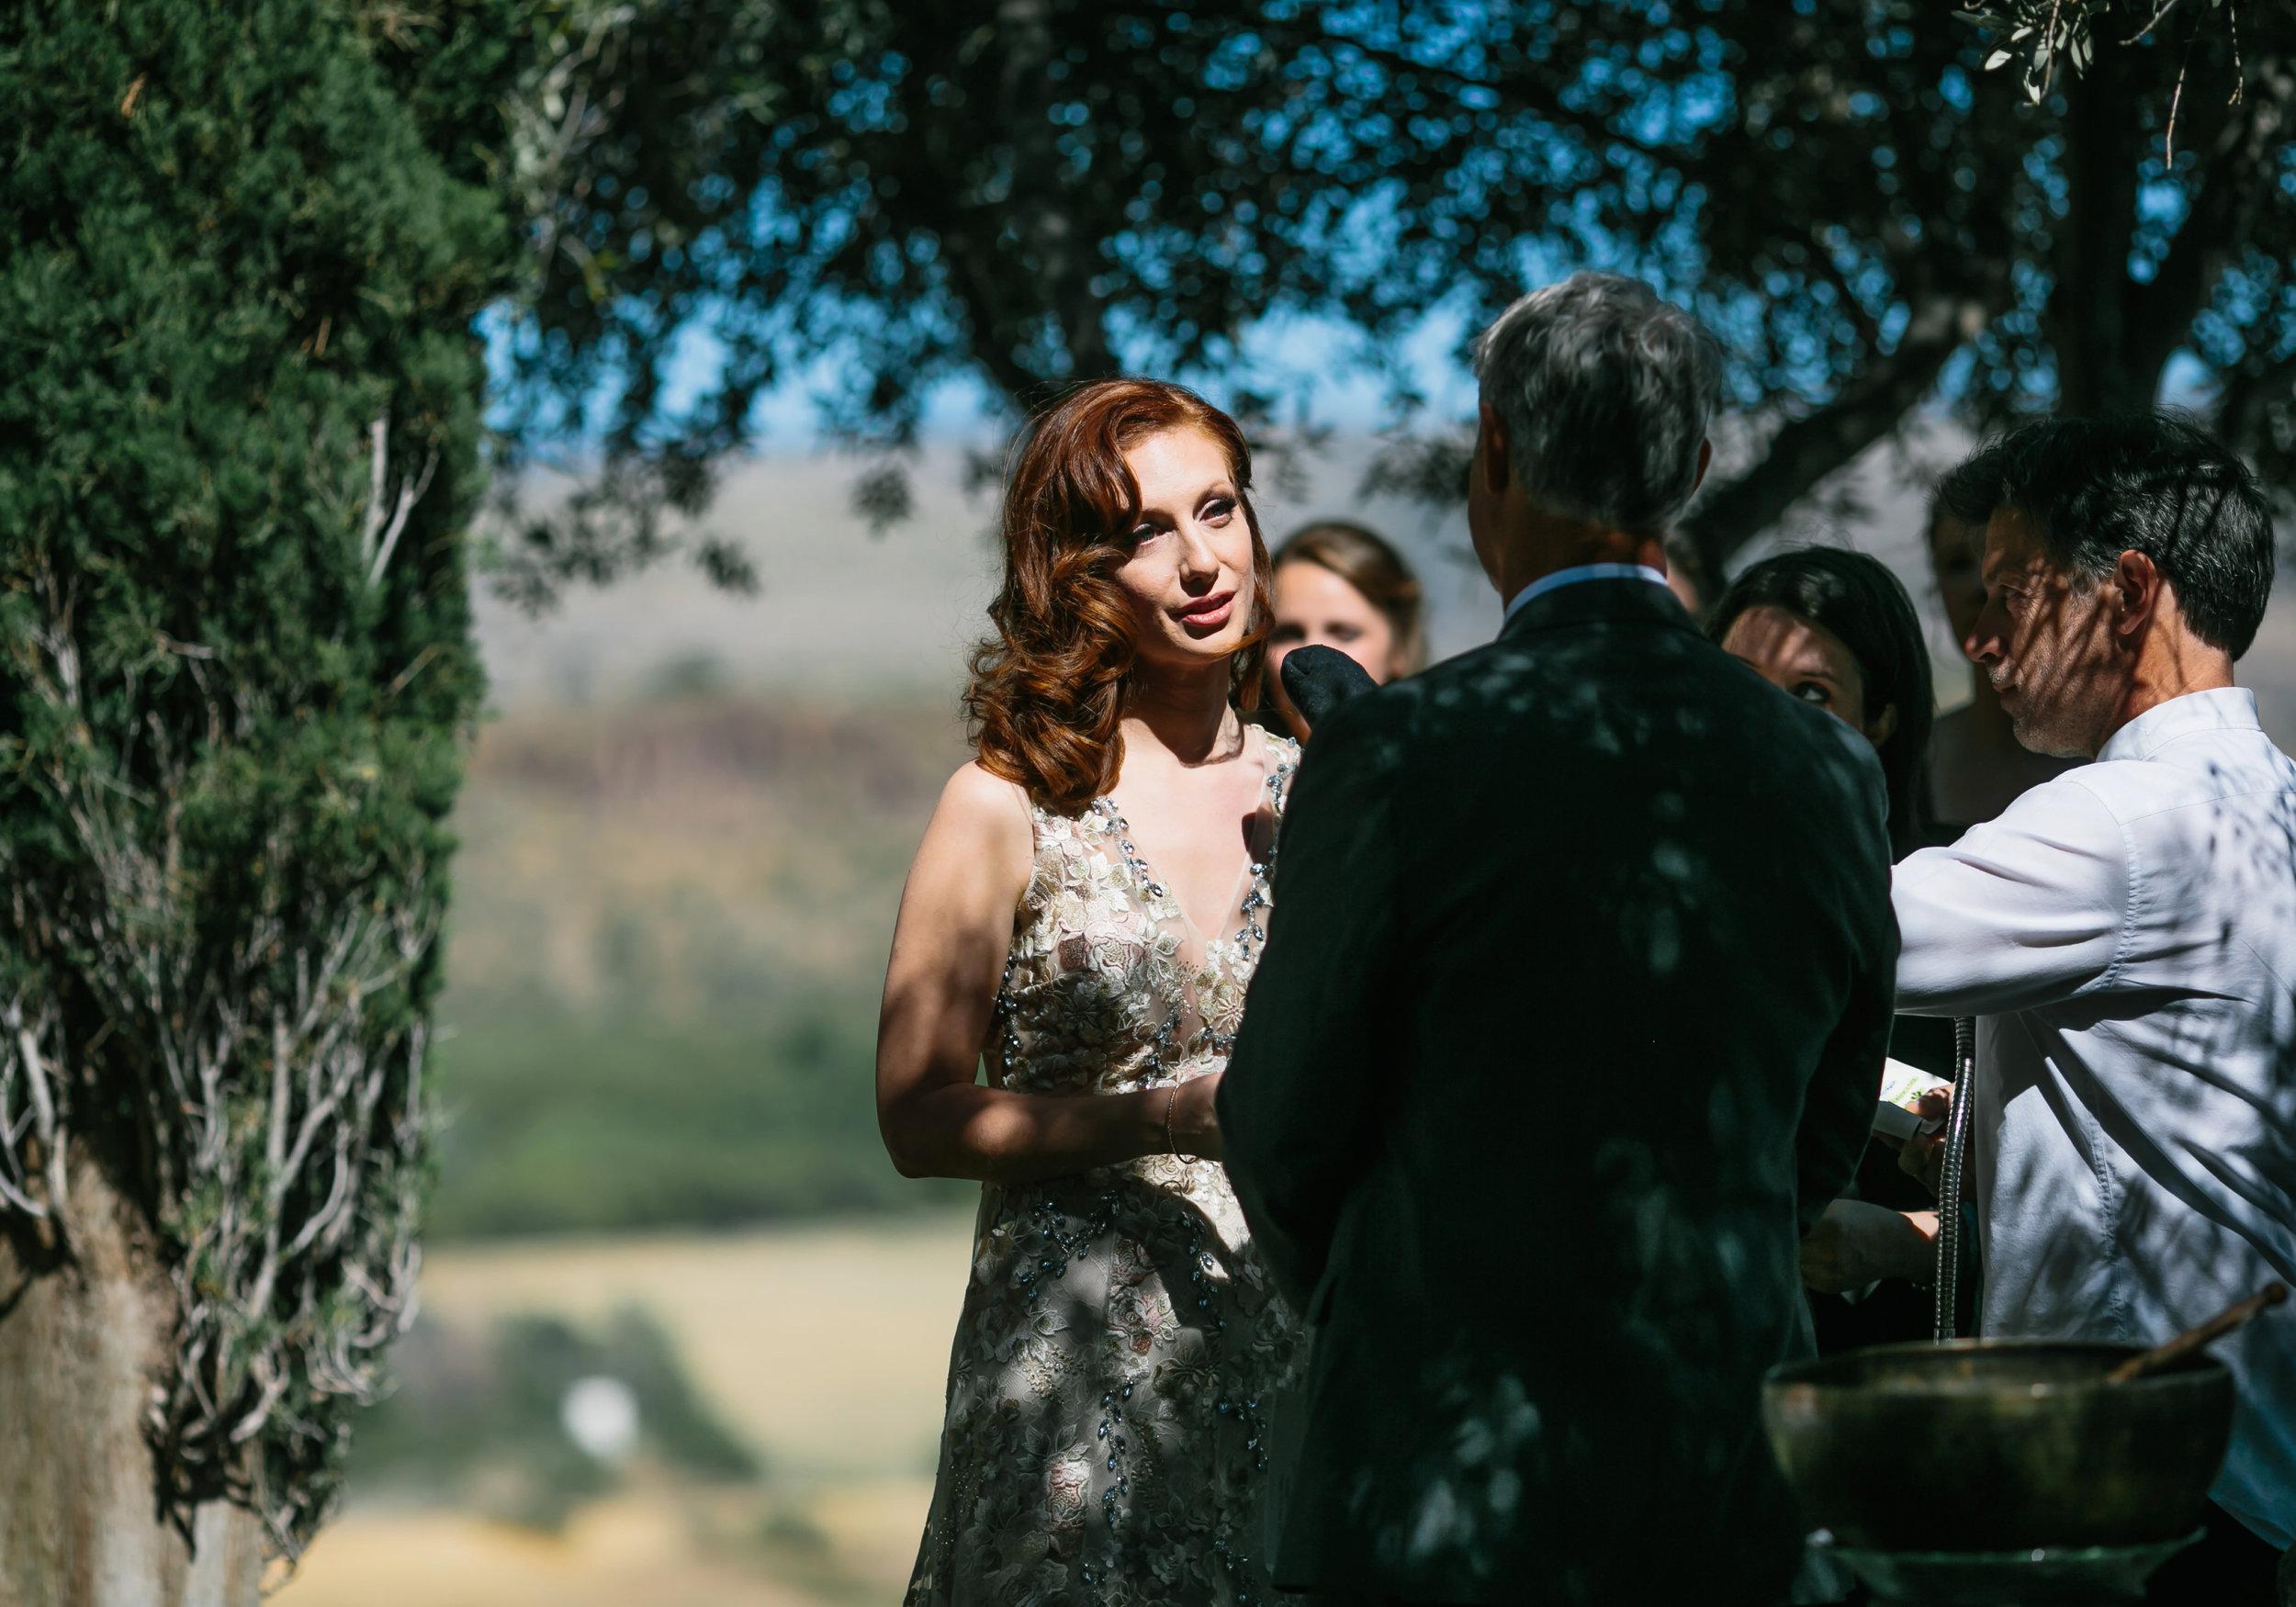 arcosanti-wedding-photography0019.JPG